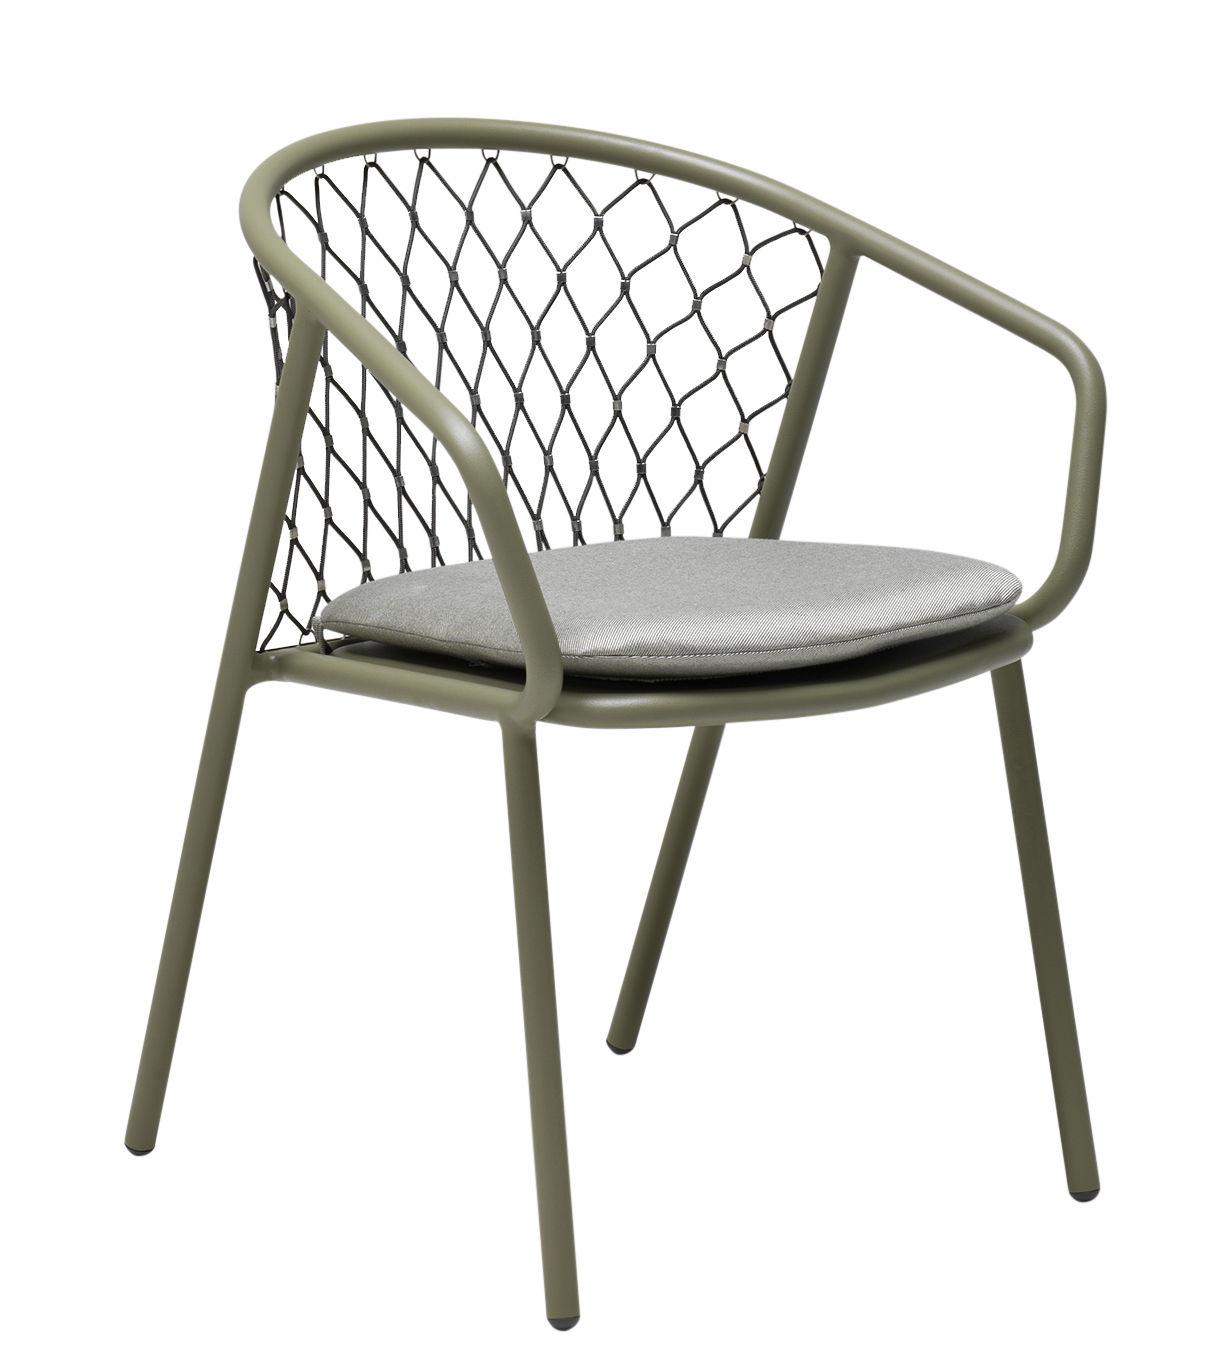 Möbel - Stühle  - Nef Sessel / Metall & Polyester - Emu - Lehnstuhl / grau-grün & Rückenlehne grau - Cordes synthétiques, klarlackbeschichtetes Aluminium